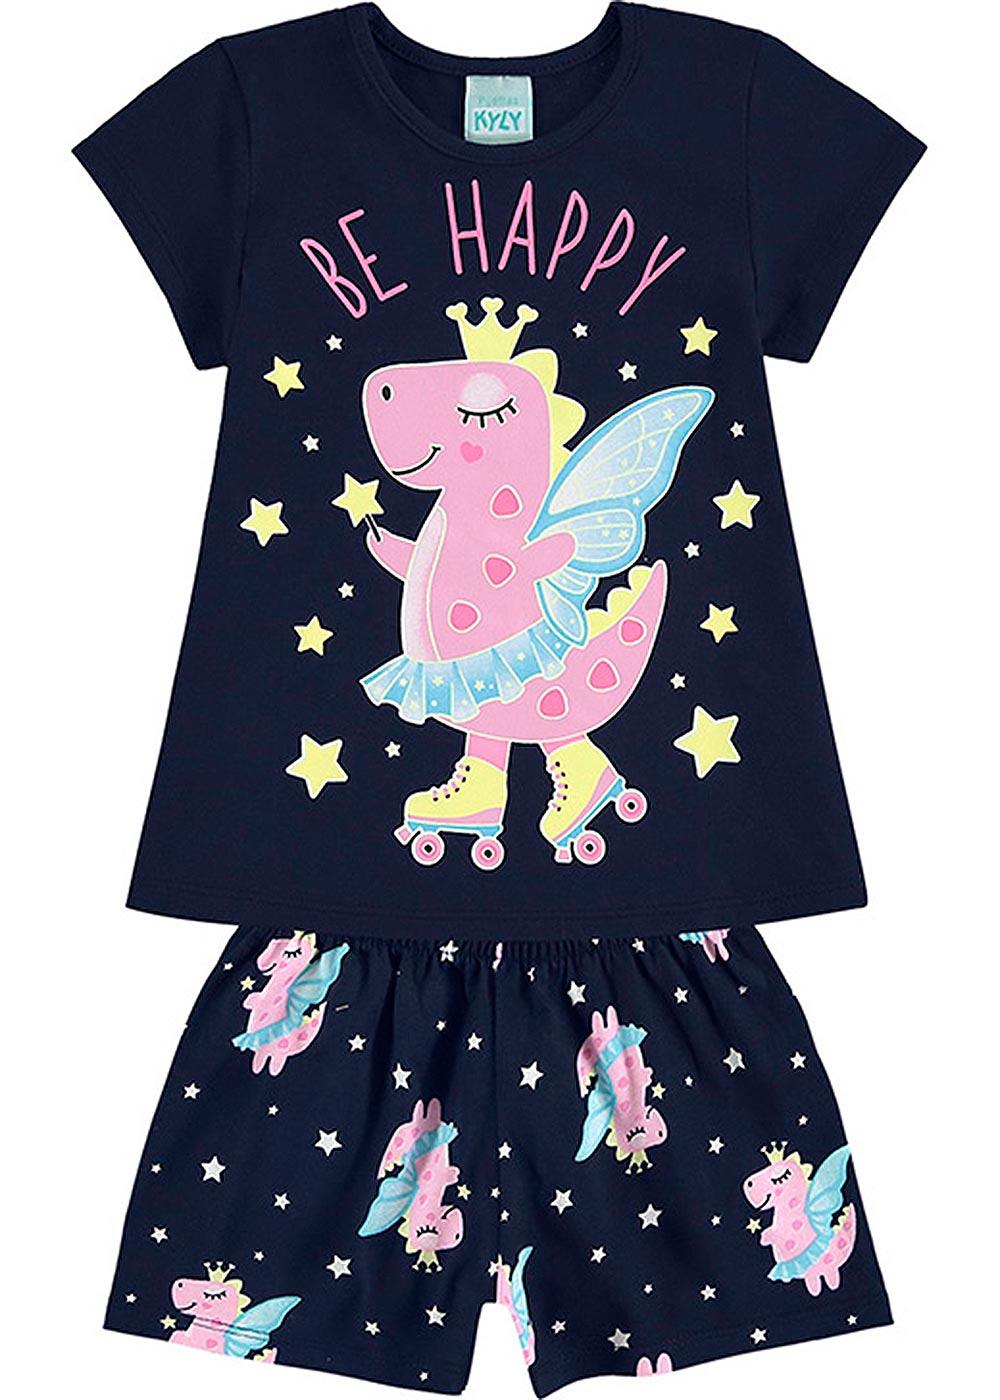 Pijama Infantil Feminino Verão Marinho Be Happy - Kyly